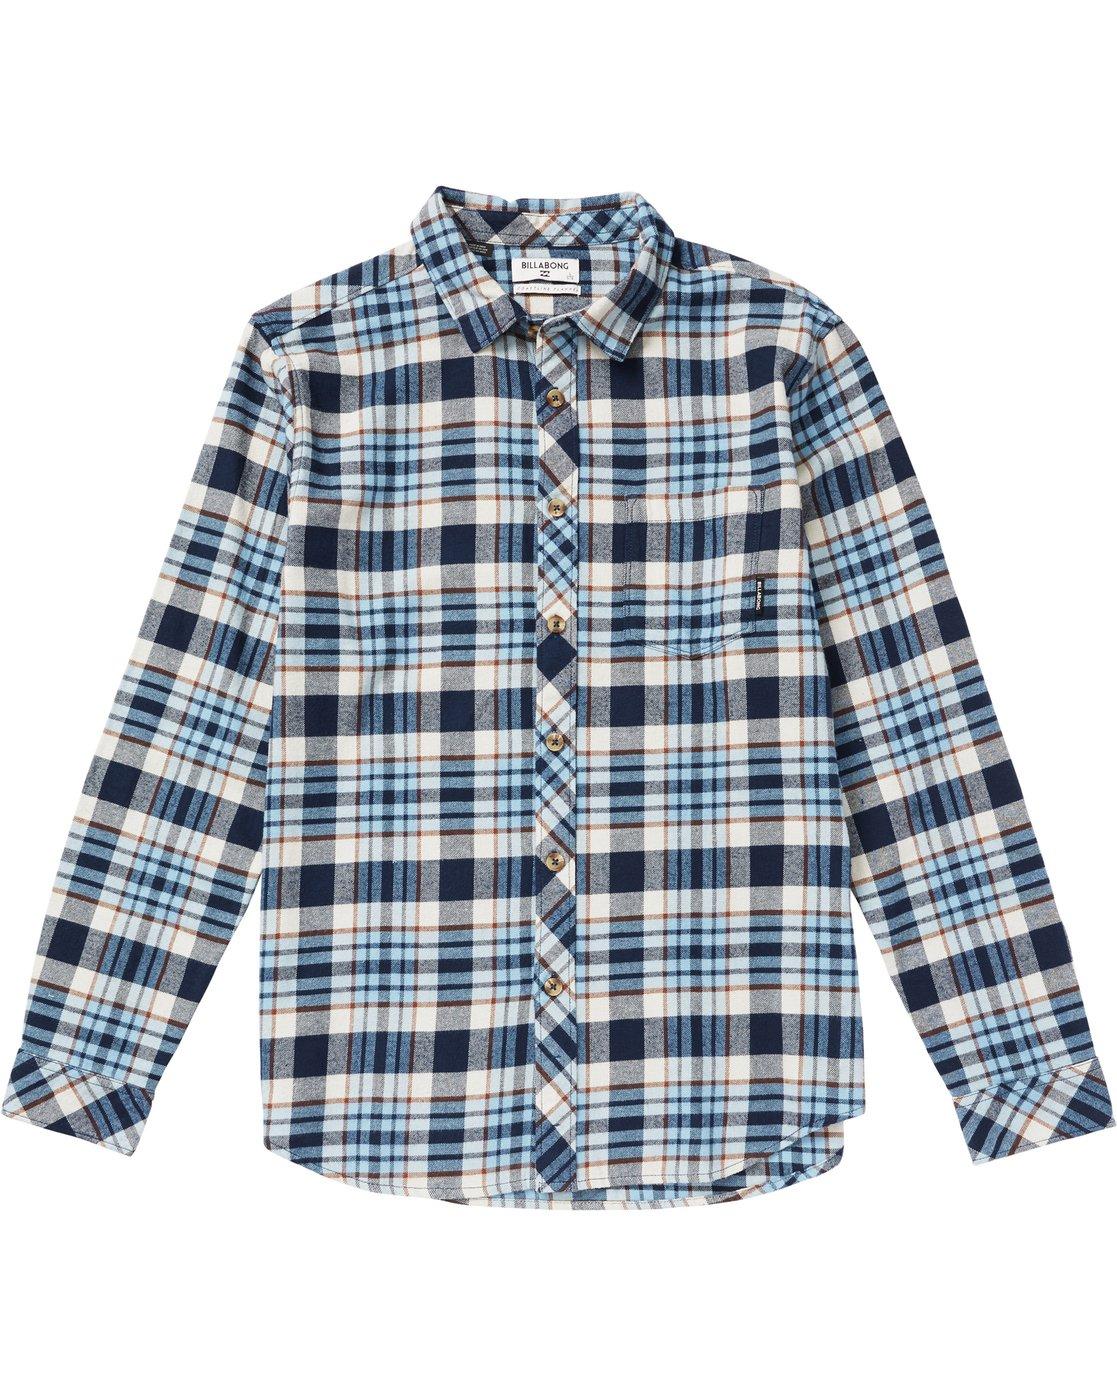 afb738e54 0 Kids' Coastline Plaid Flannel Shirt Blue K532SBCO Billabong